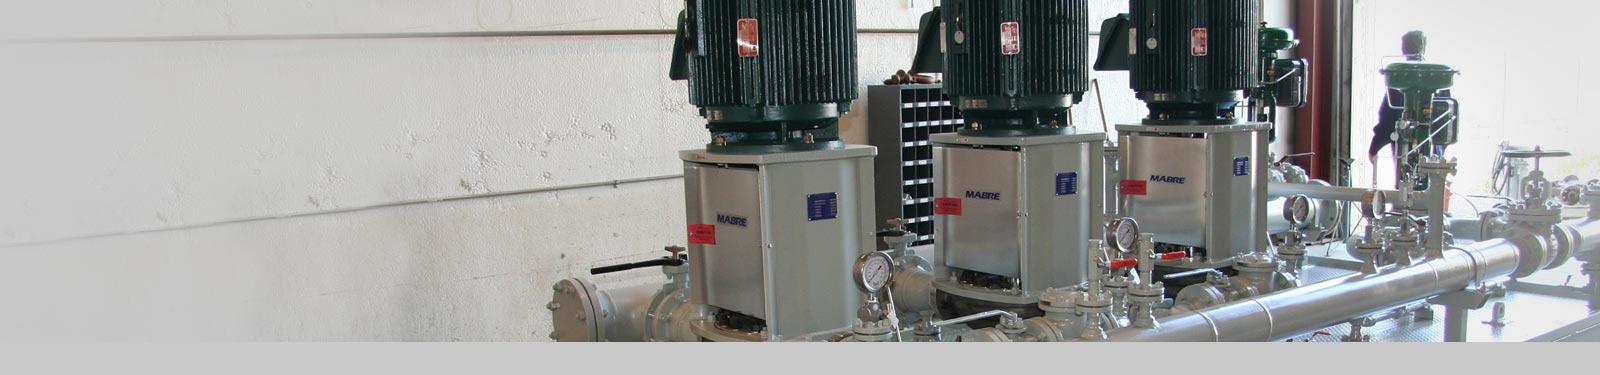 Westpower Home Slider Engineered Pumps